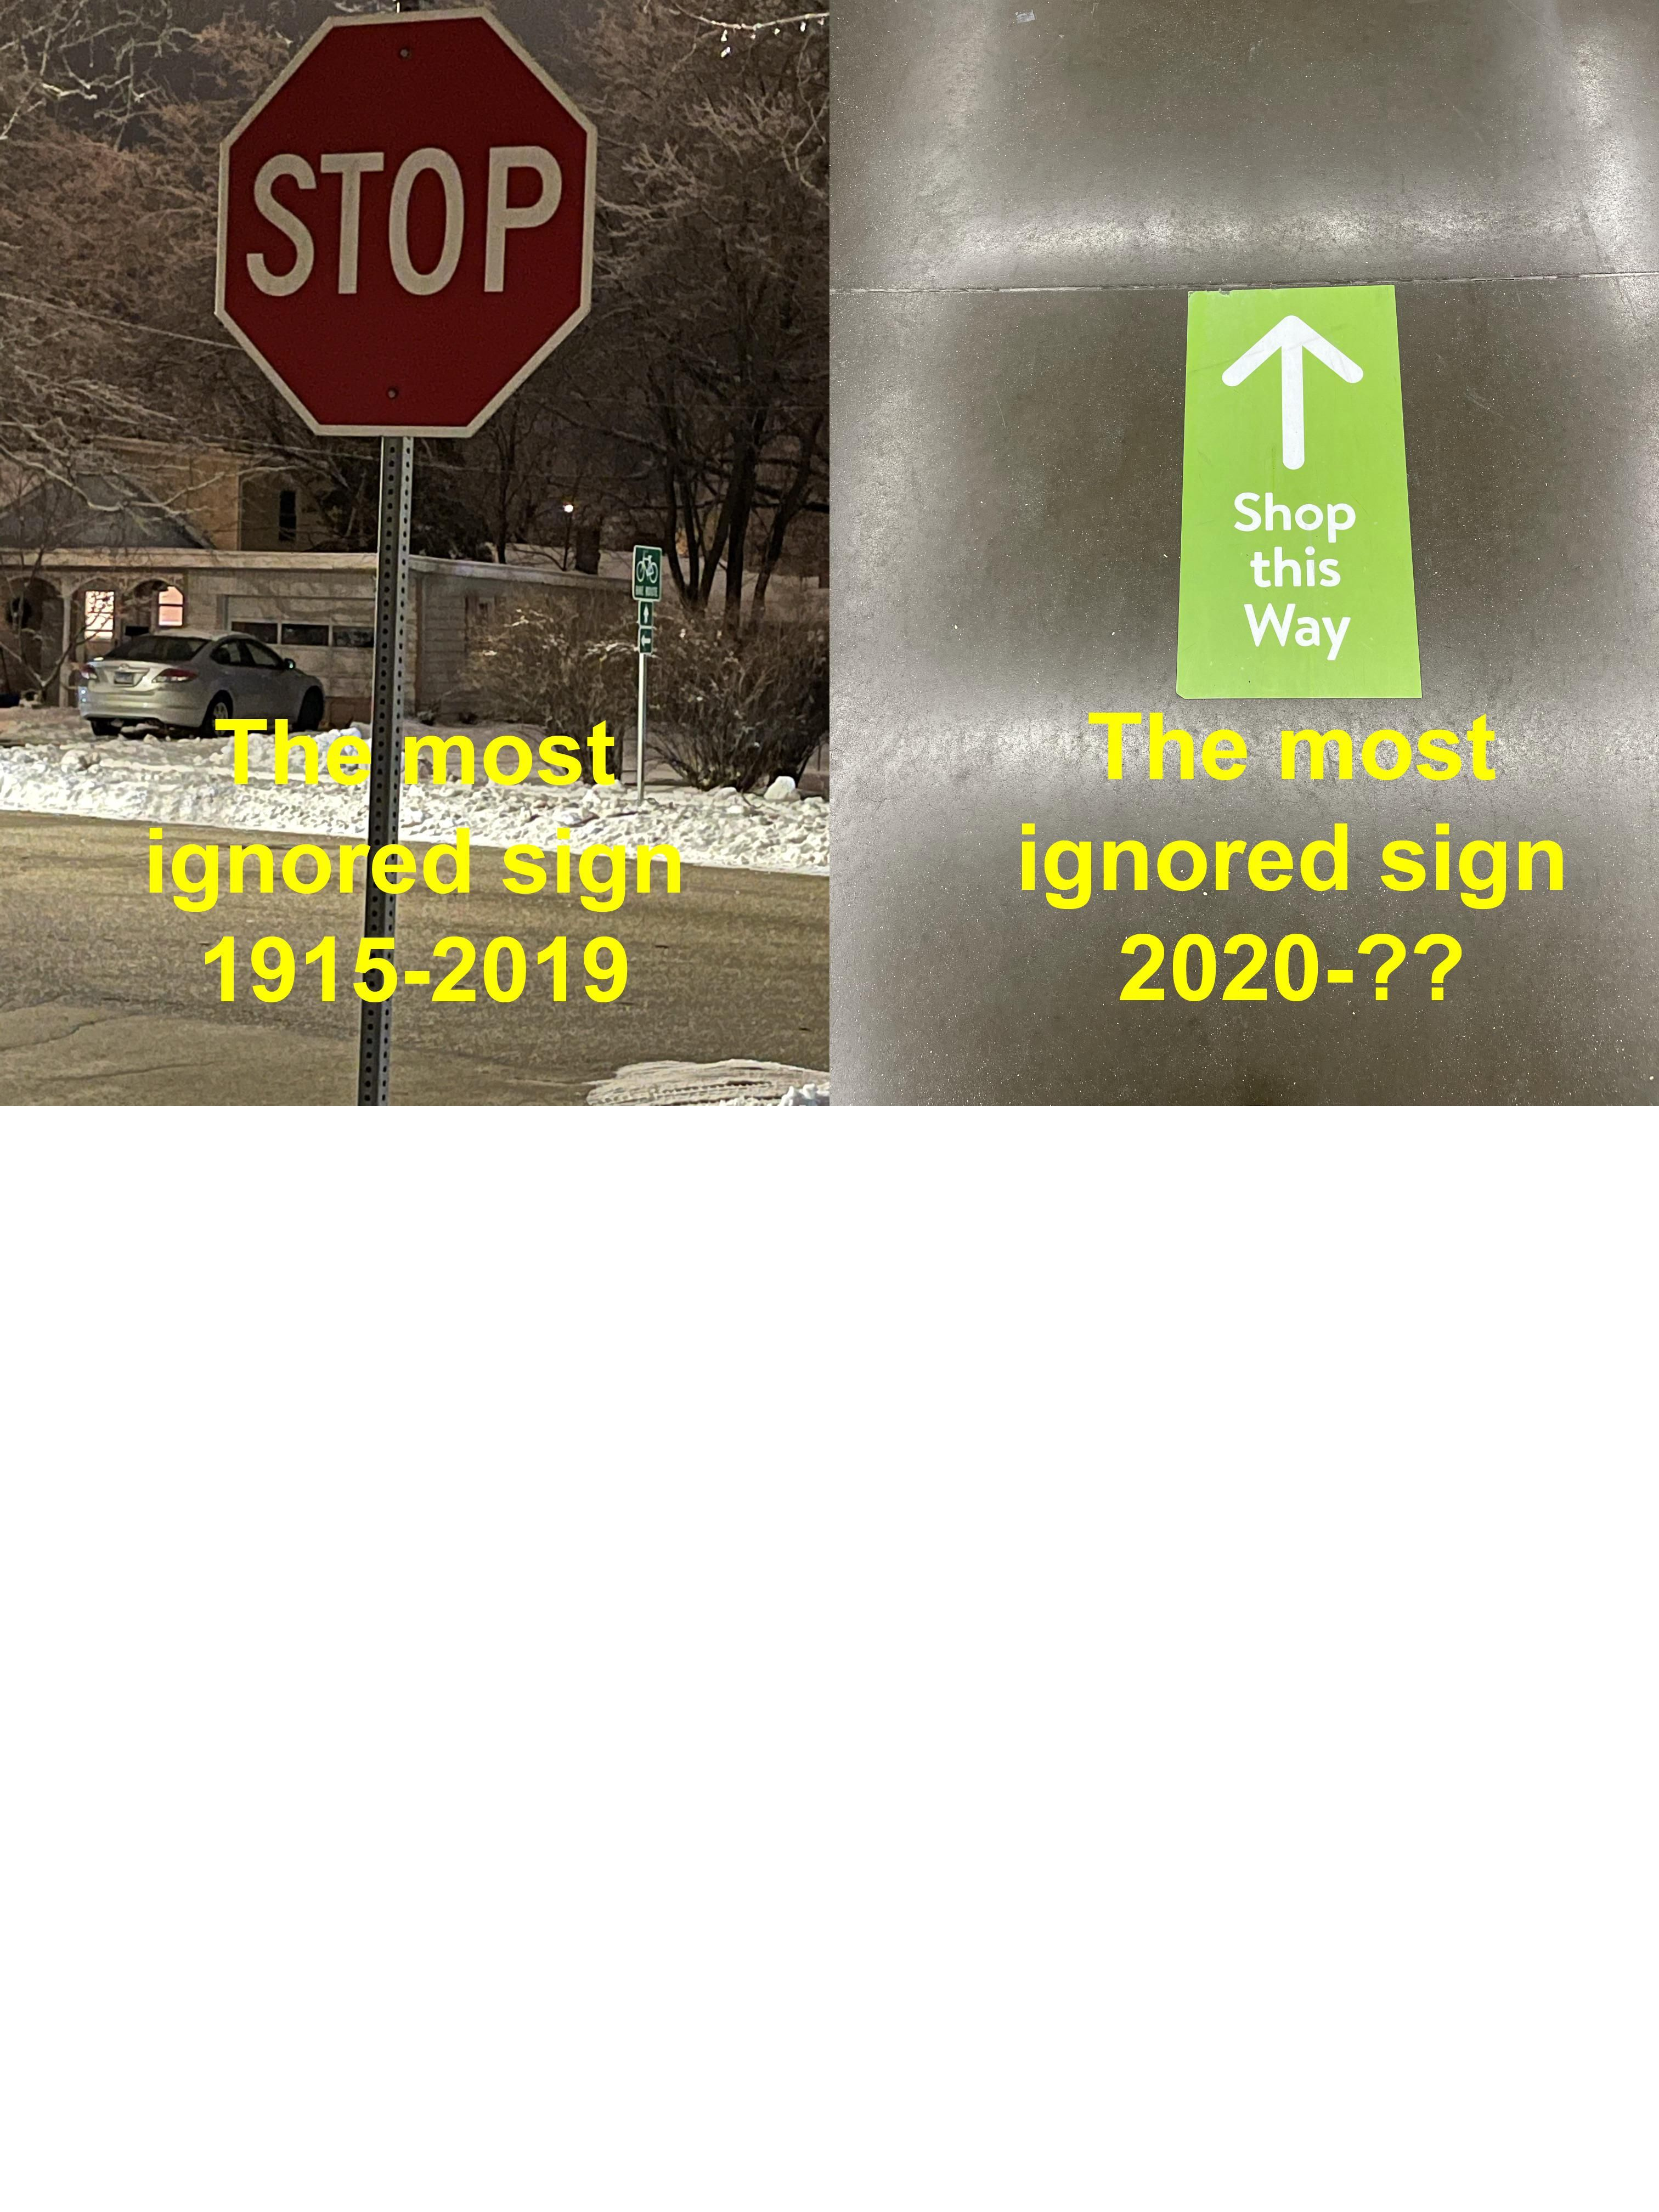 Ignoring signs...